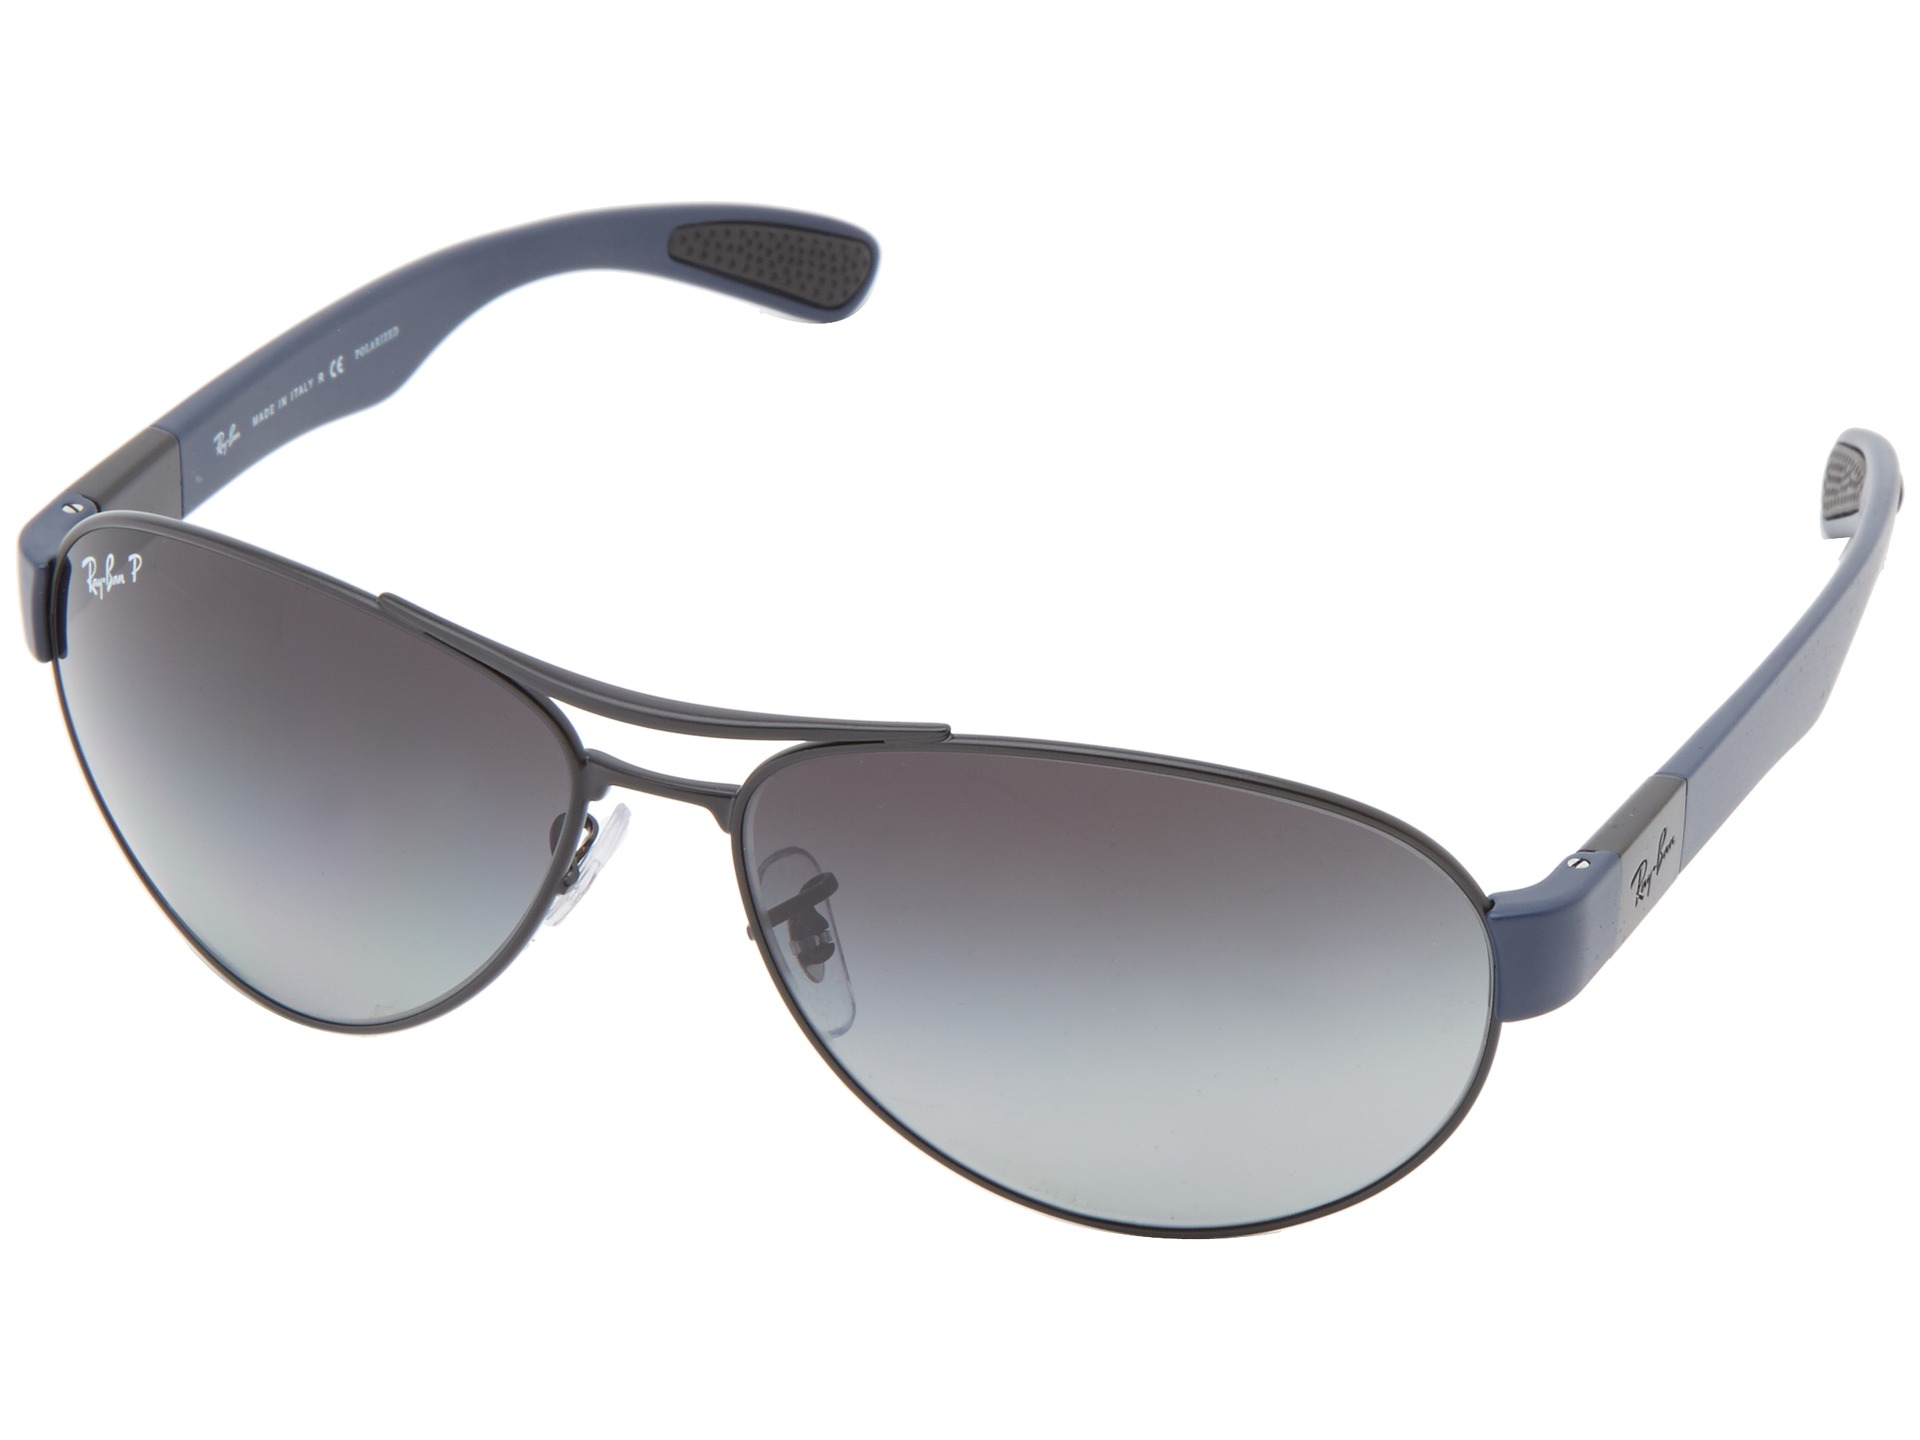 8010edbeda Kids Sunglasses Polarized Ray Ban « Heritage Malta